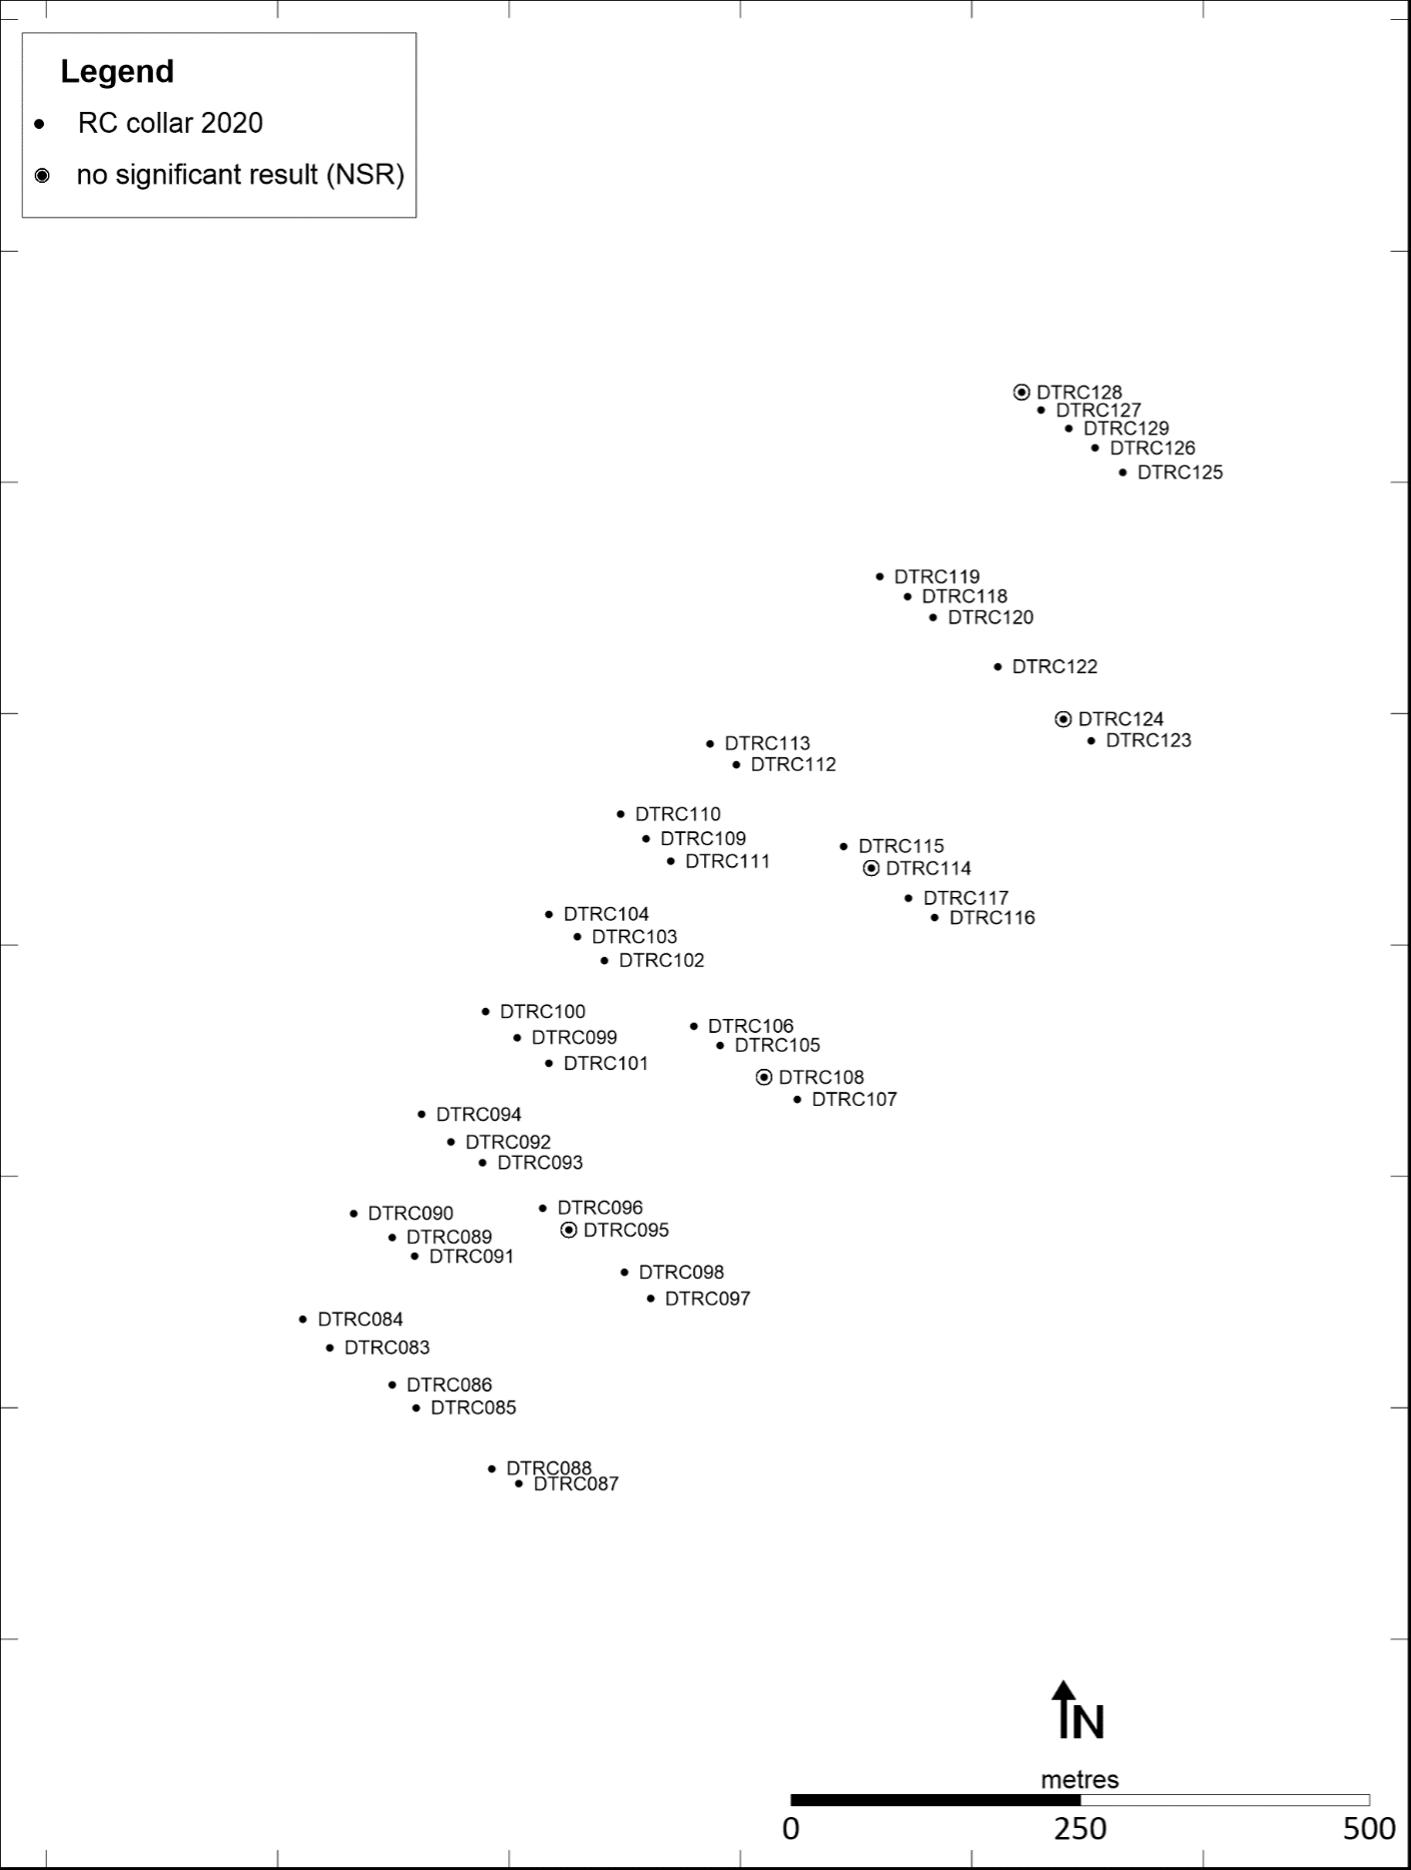 Figure 4 - Makosa North RC drillhole location map